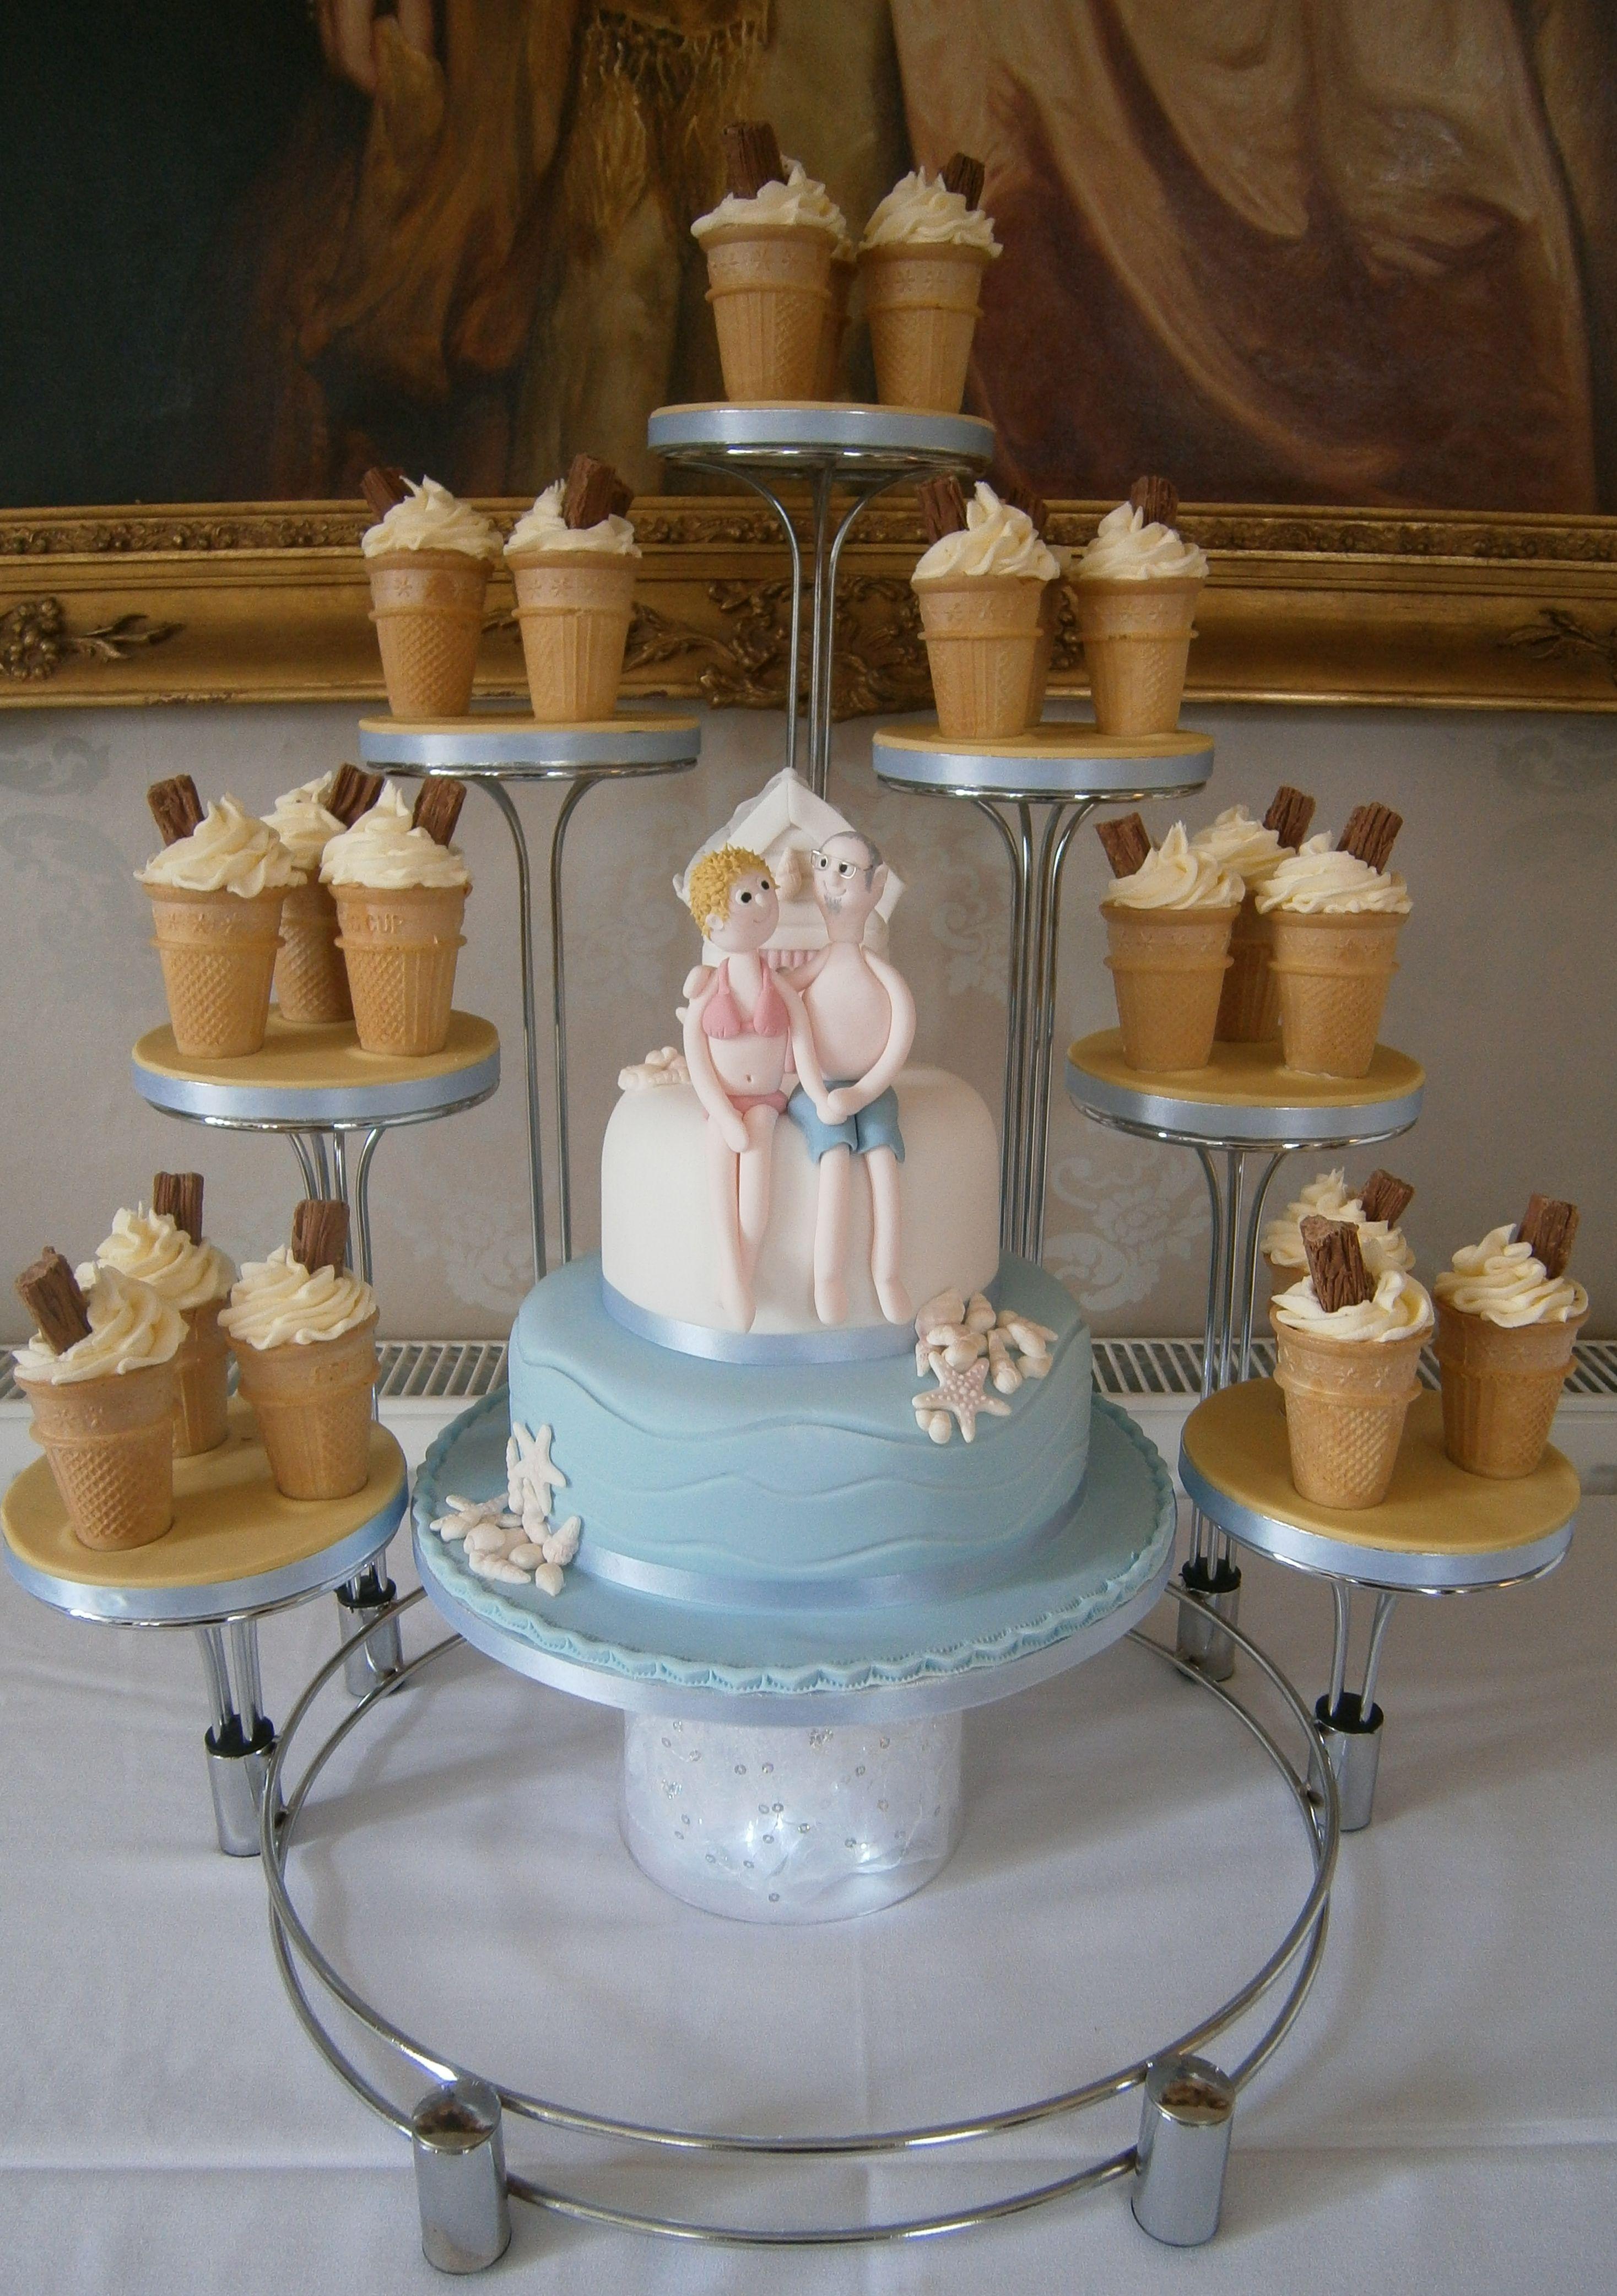 Seaside Theme Wedding Cake With Ice Cream Cup Cakes